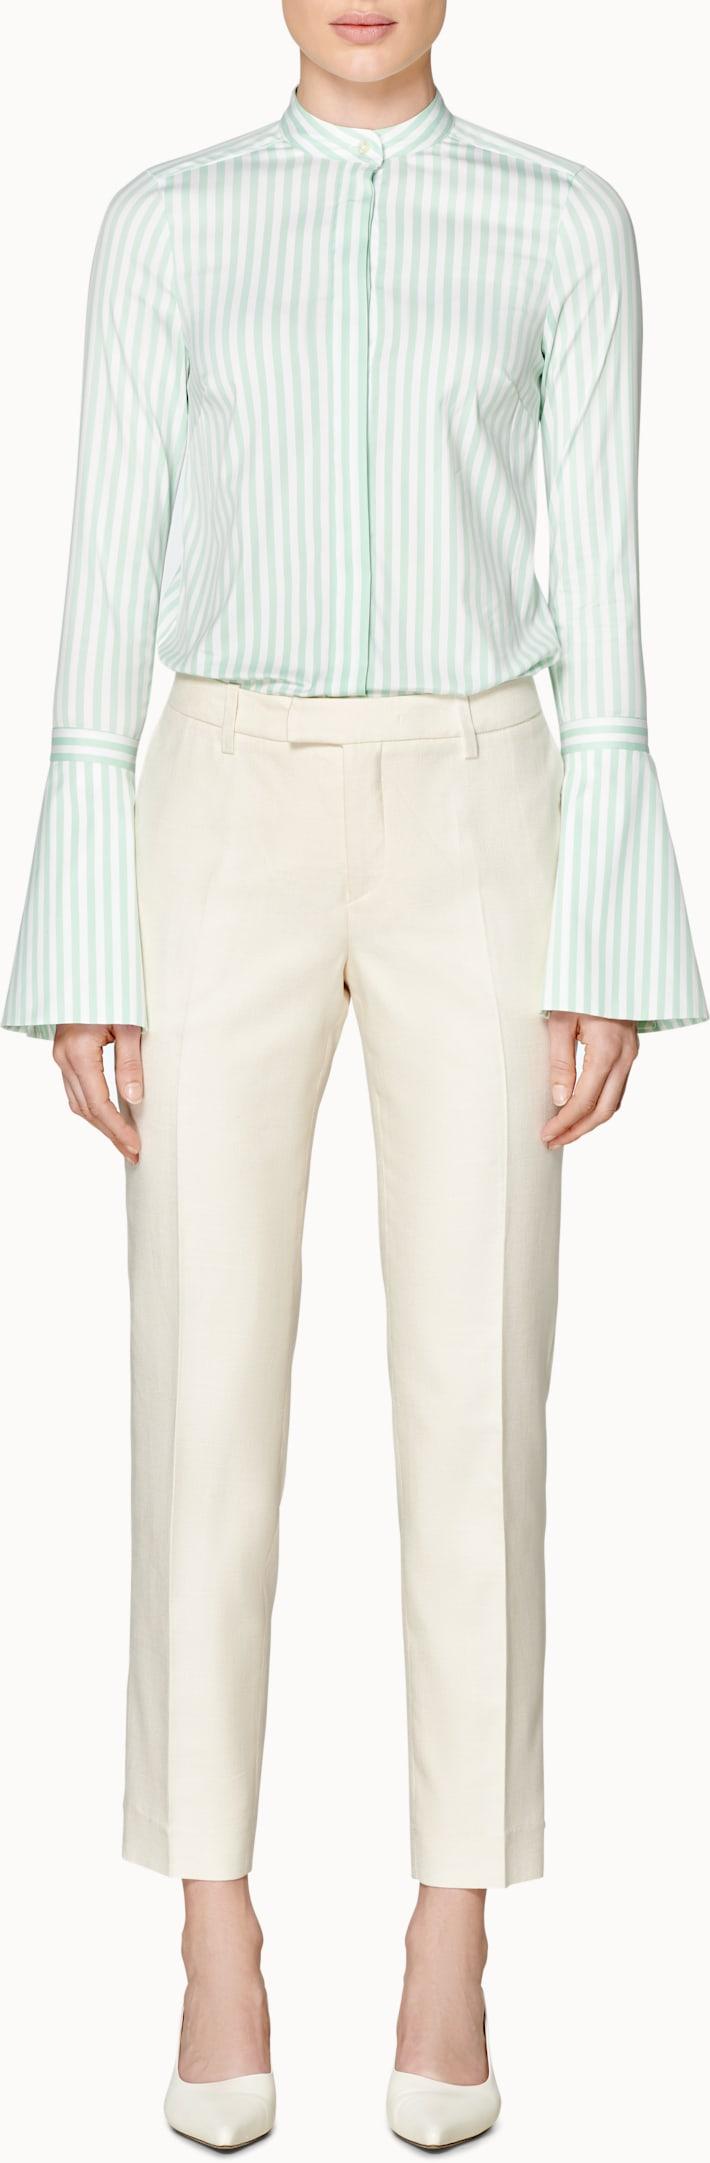 Calypso Mint Striped Shirt